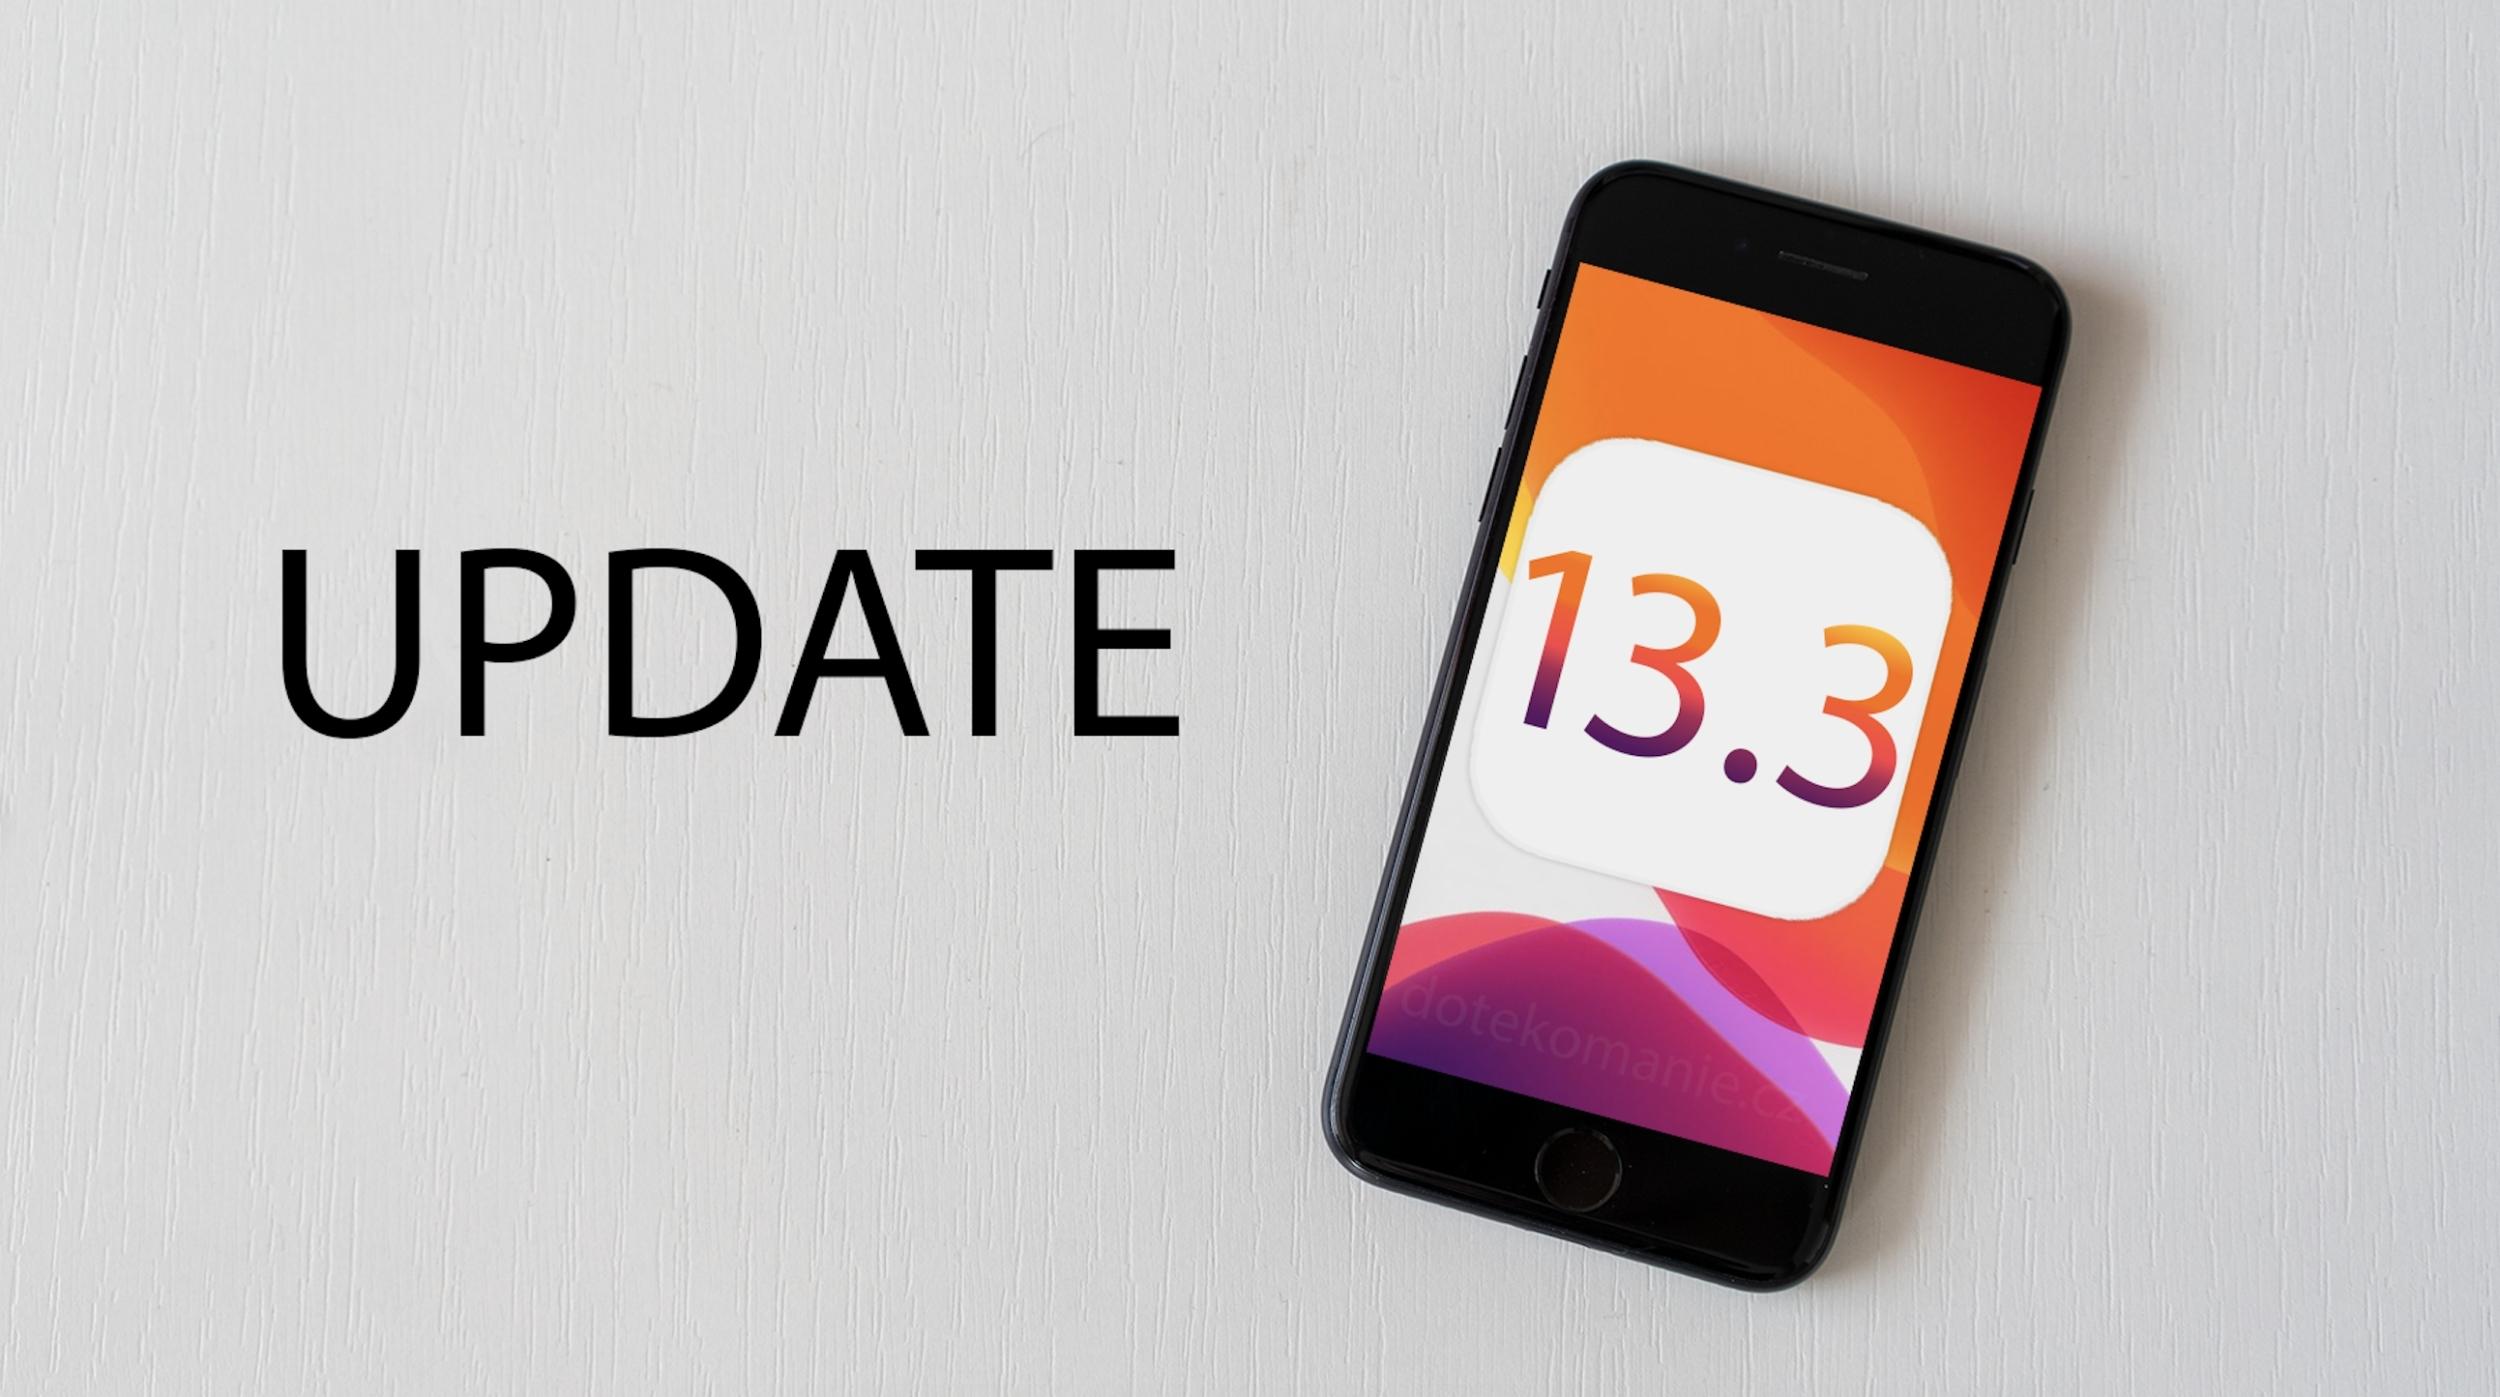 Apple vydal čtvrtou betu iOS 13.3 a iPadOS 13.3